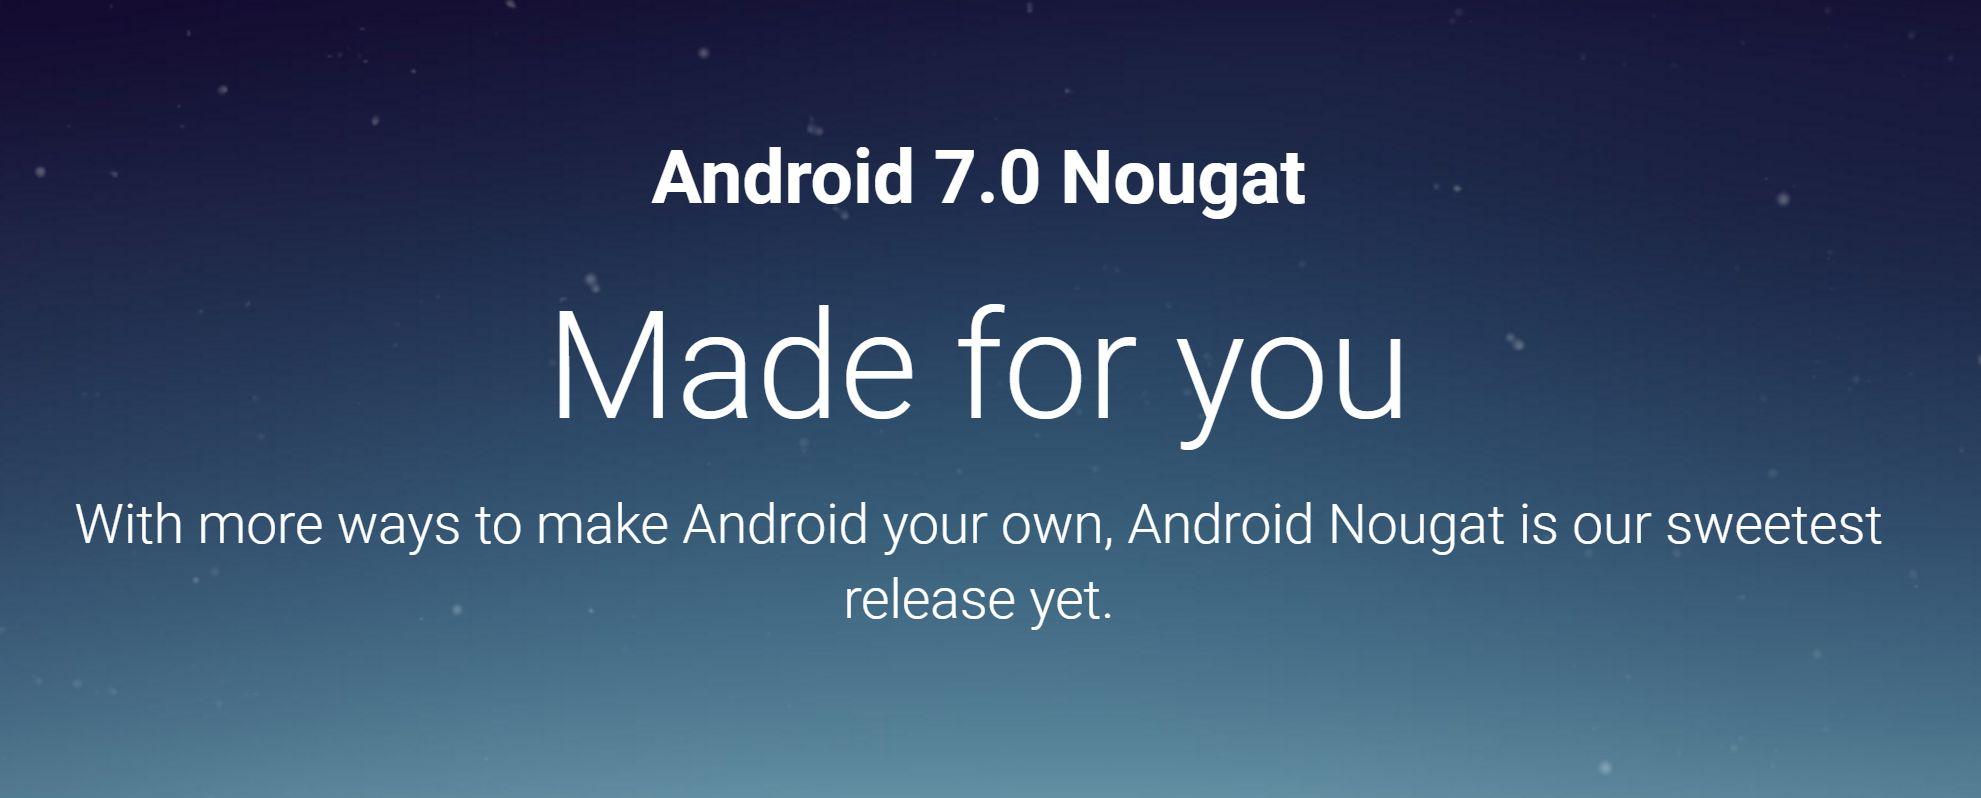 Google planuje częstsze aktualizacje Androida 23